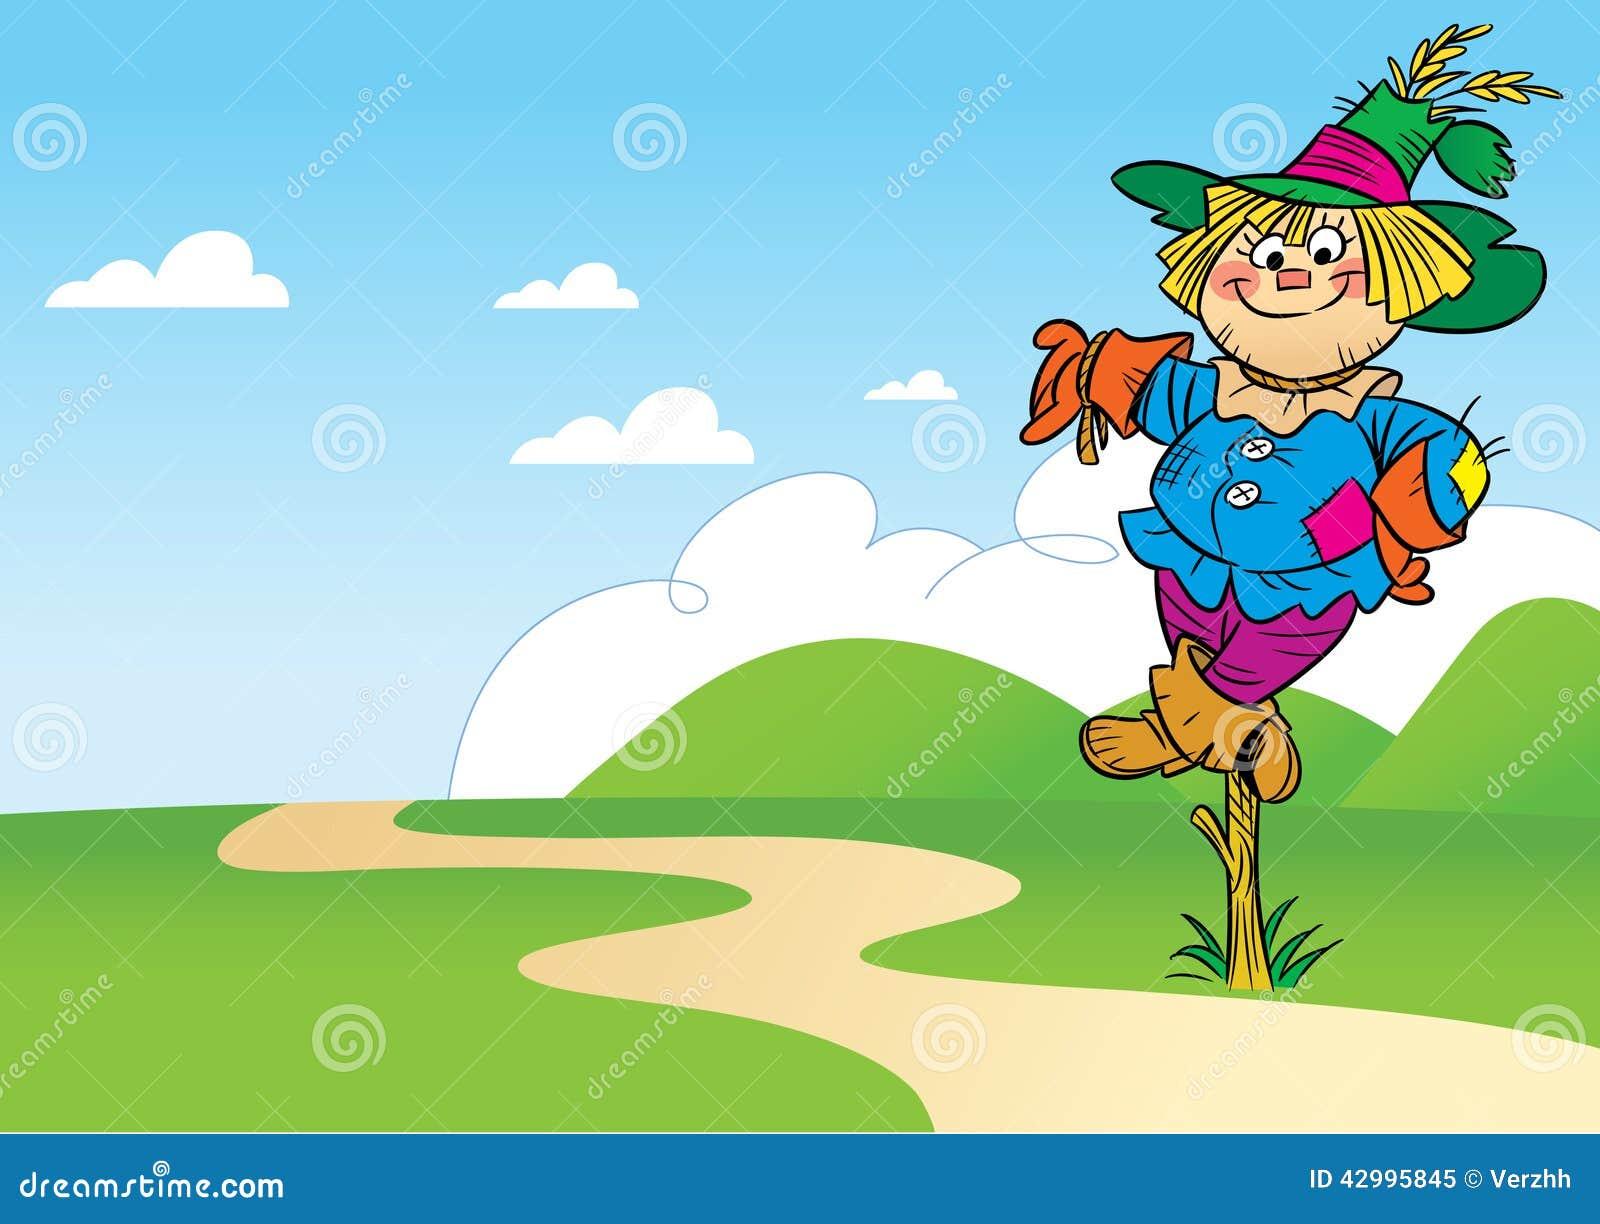 Cute cartoon scarecrow funny scarecrow stock photo image 42995845